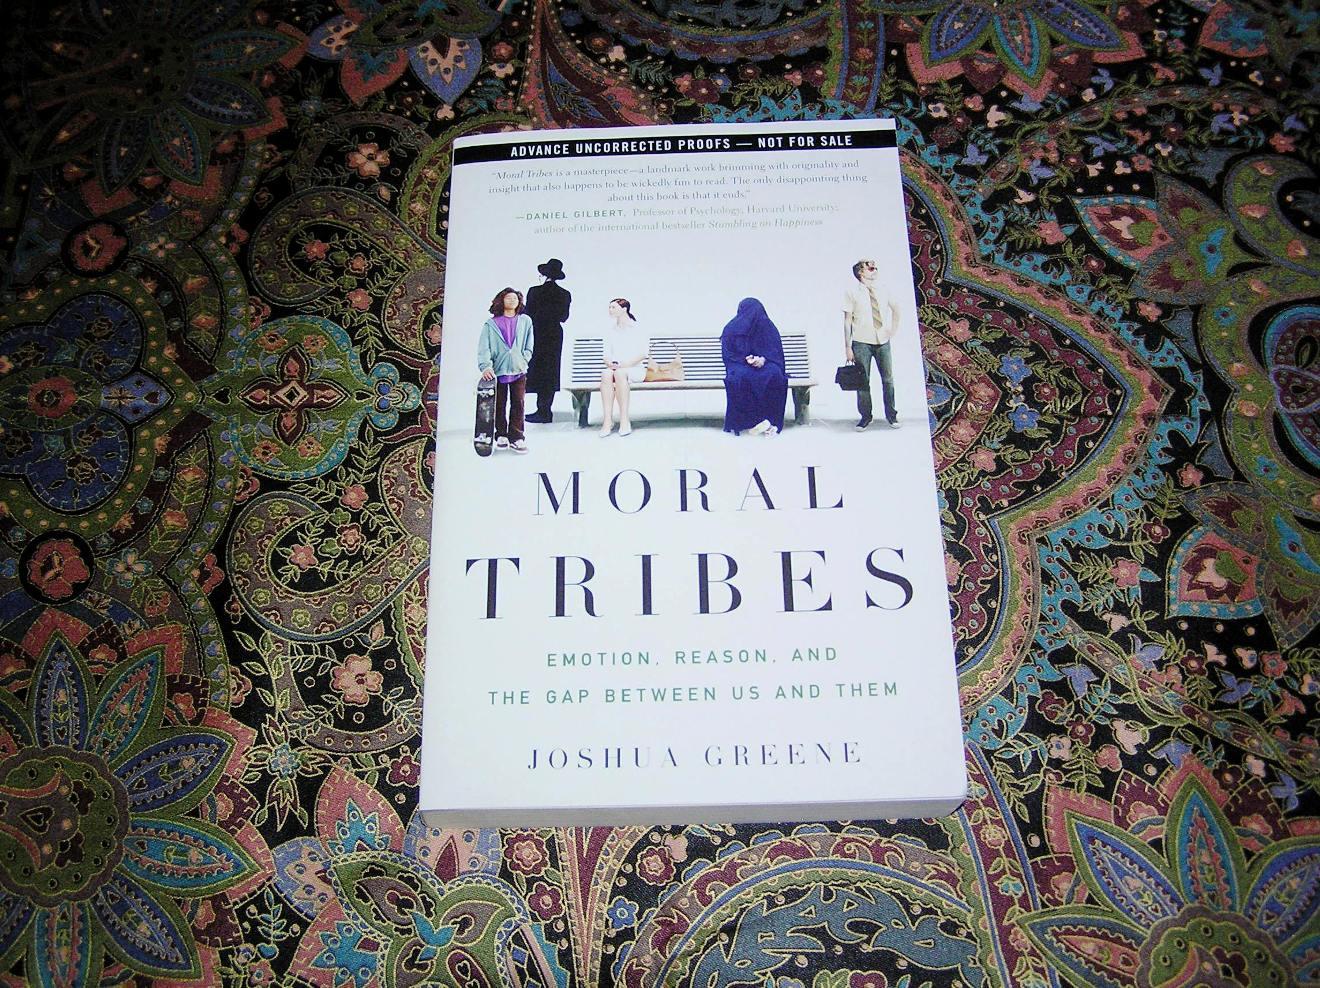 moral tribes greene joshua